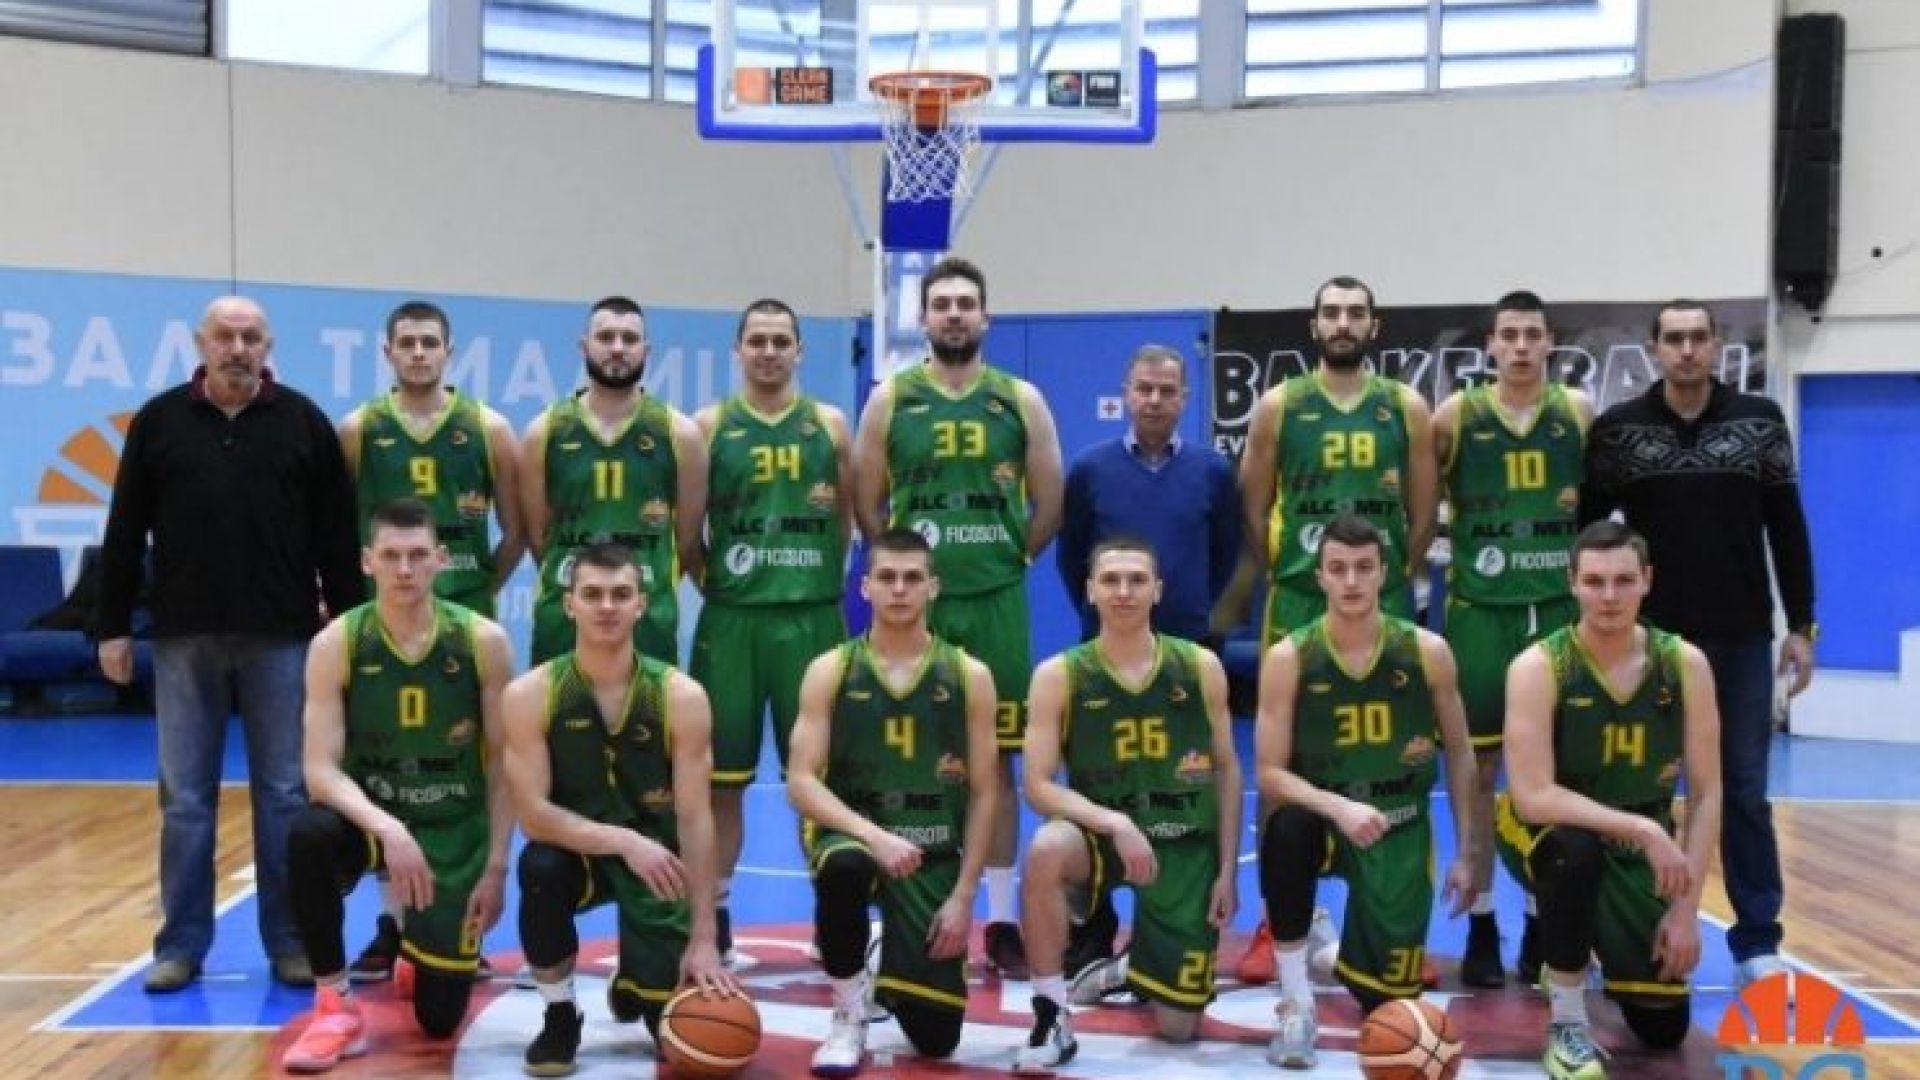 Абсурдно: Български отбор завърши мач с шестима баскетболисти